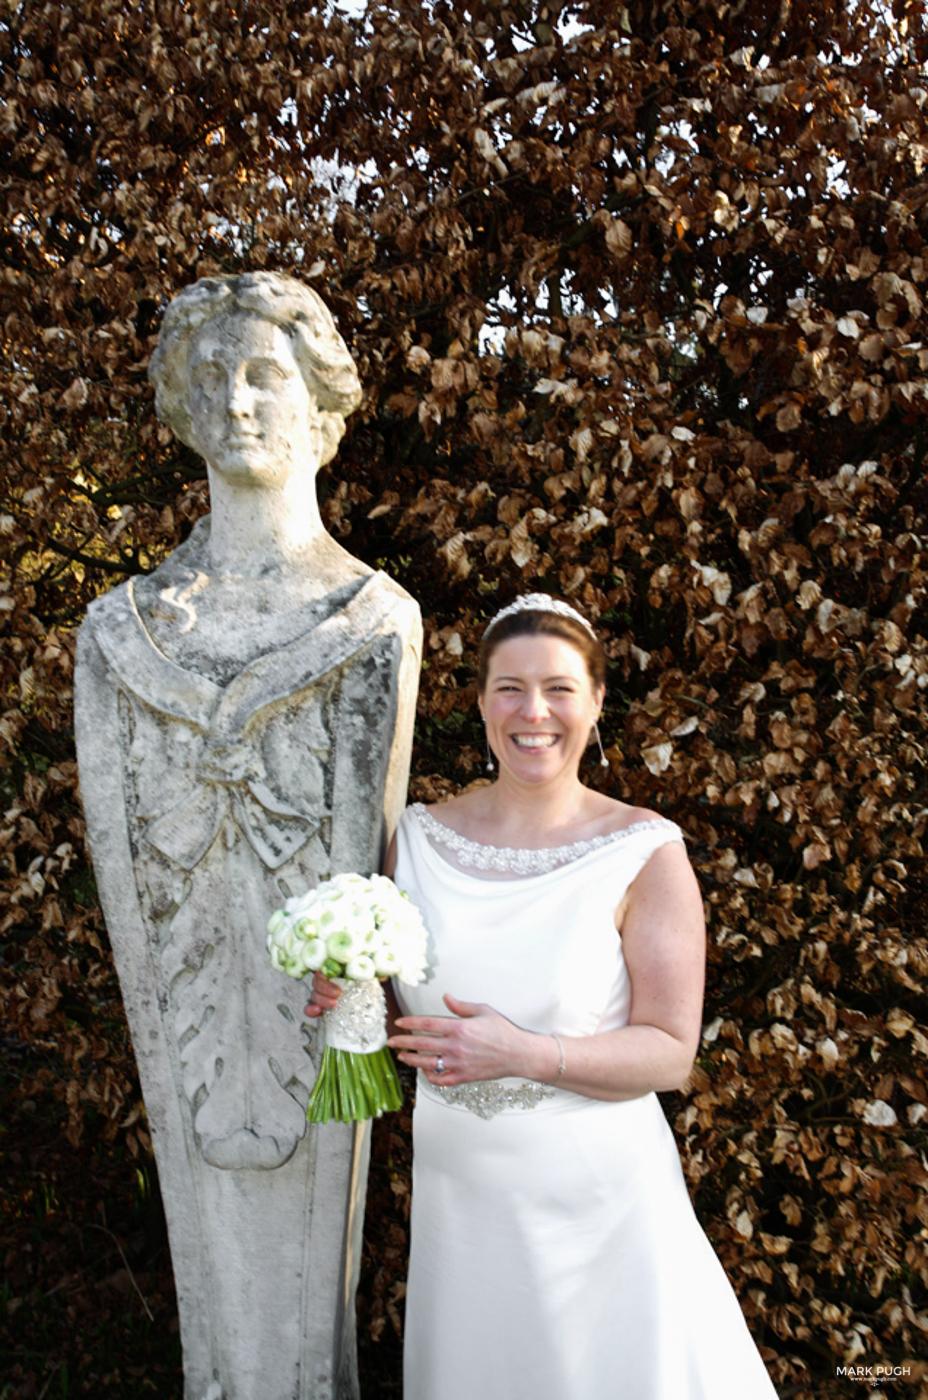 140  - Helen and Tim - Wedding Photography at Chatsworth House Bakewell Derbyshire DE45 1PP - Wedding Photographer Mark Pugh www.markpugh.com -60.JPG